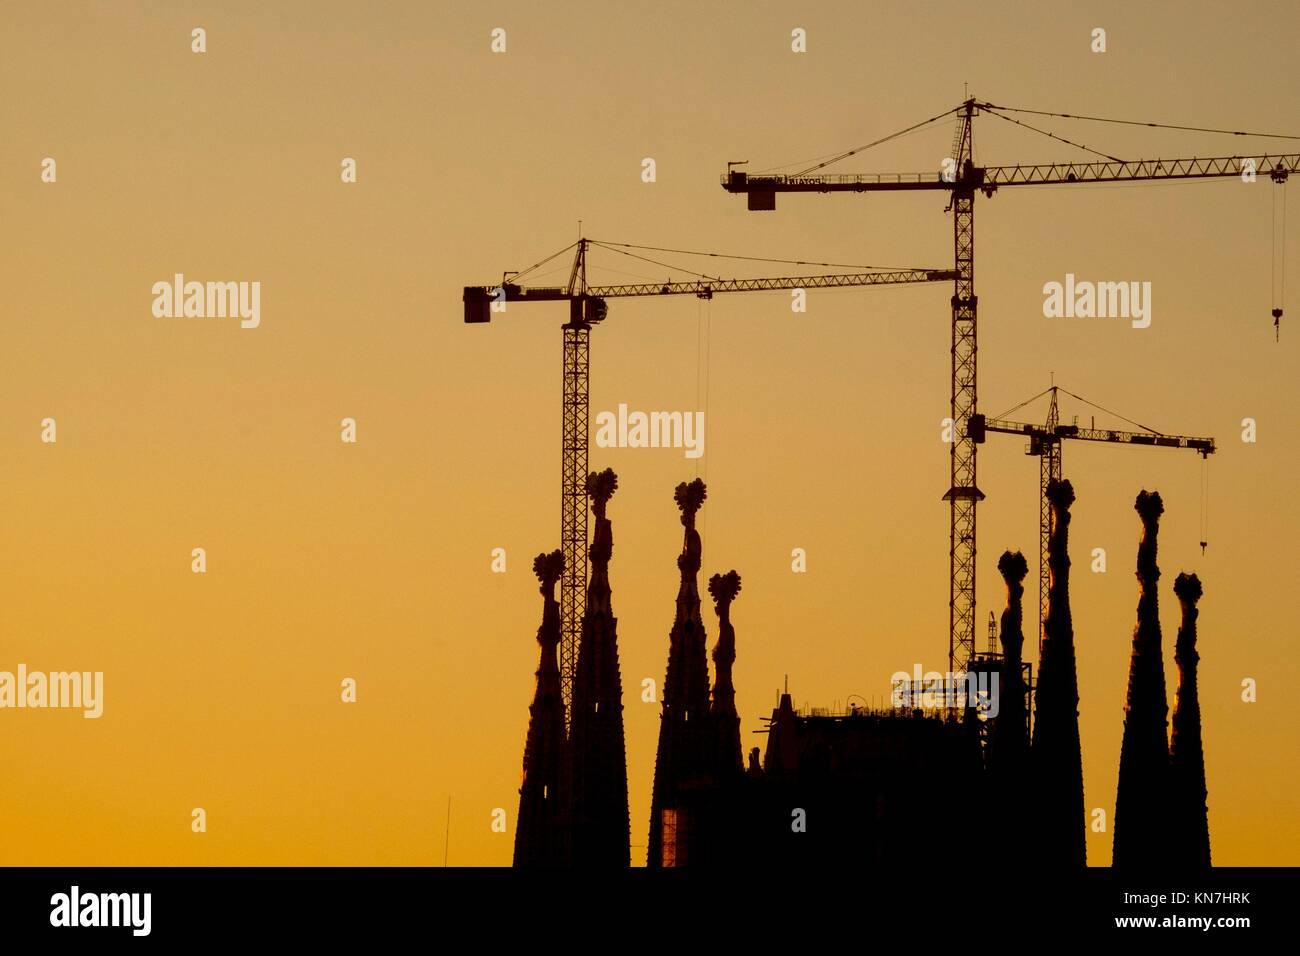 Basilika sagrada familia von antoni gaudi architekt in barcelona katalonien spaiin stockfoto - Architekt barcelona ...